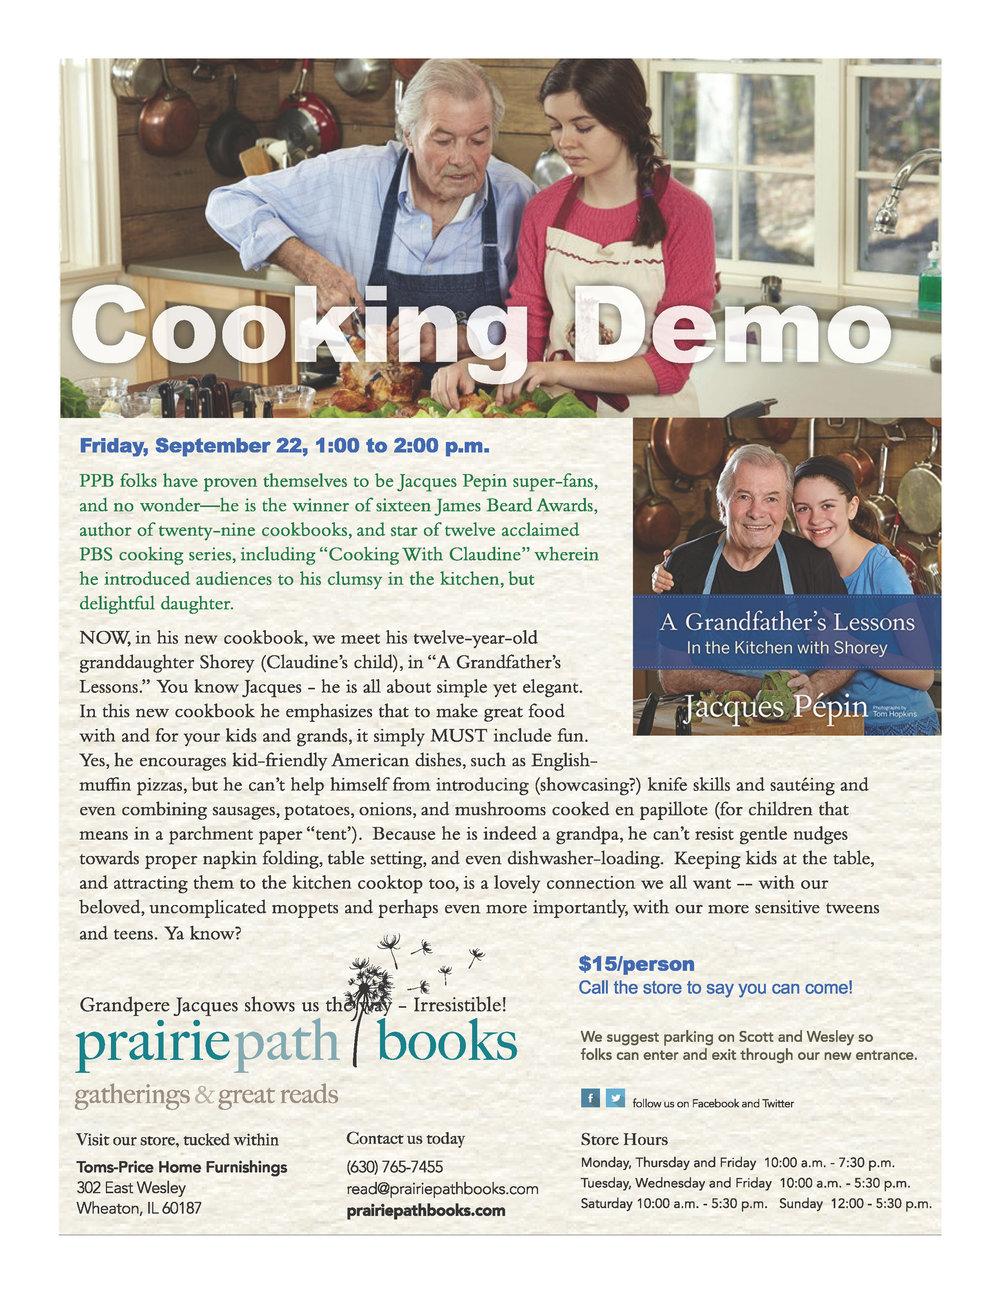 JacquesPepin_CookingDemo_Sept22.jpg